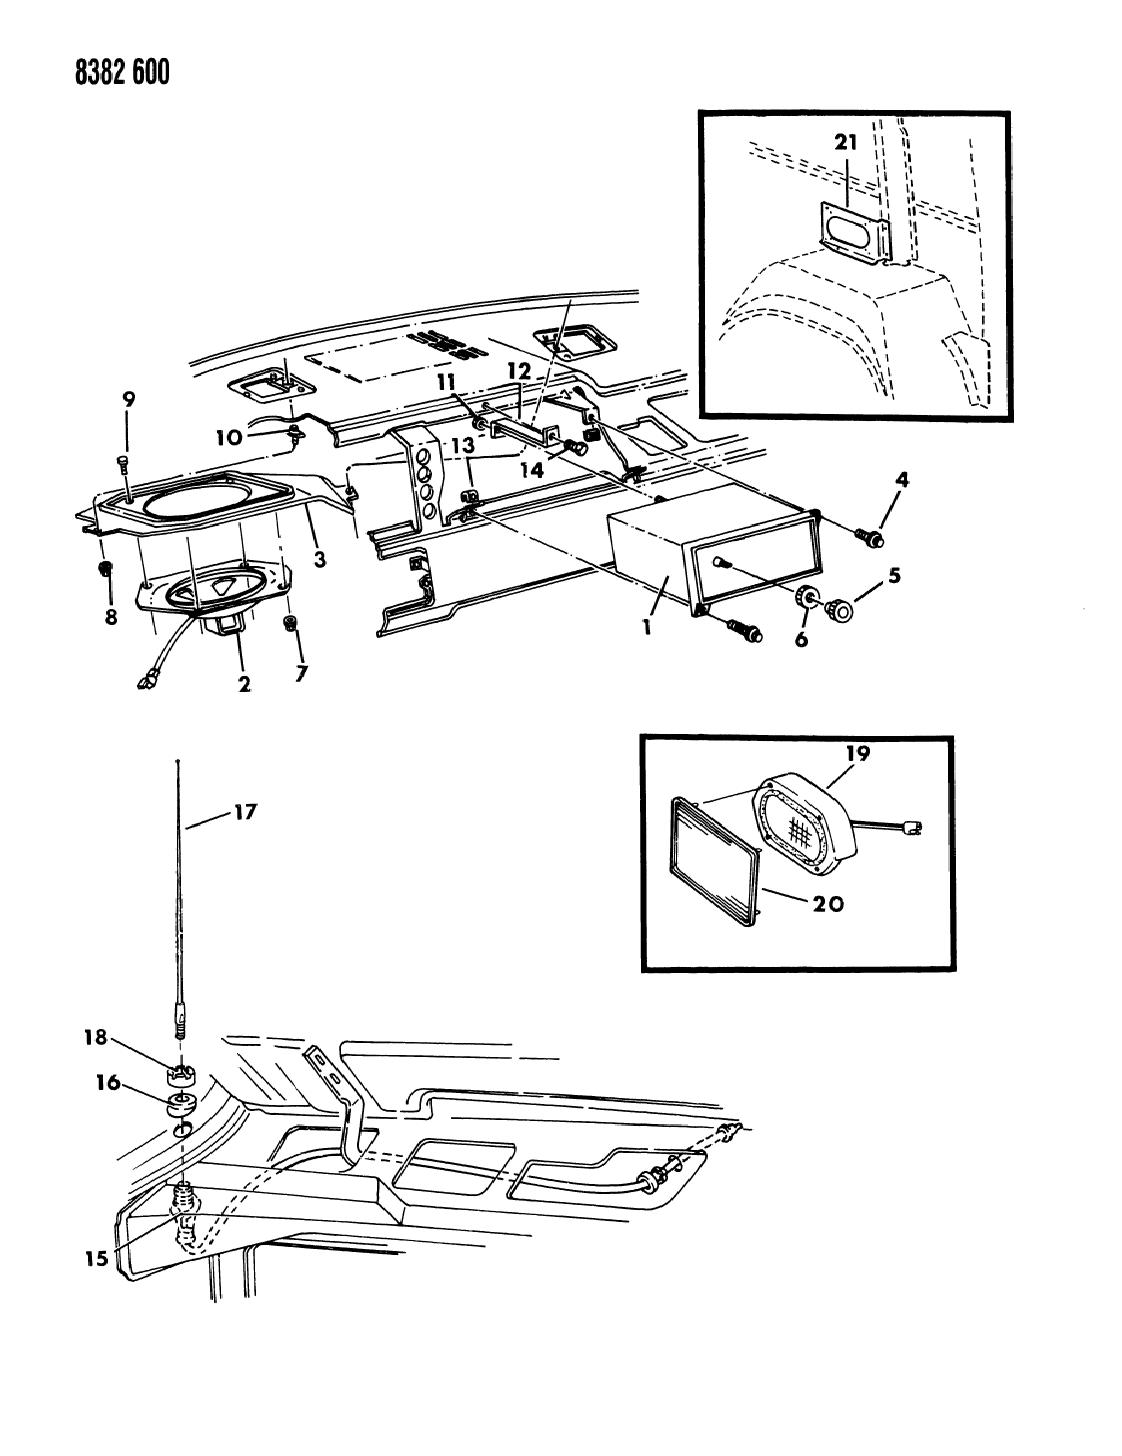 1988 Dodge Ram Van Instrument Panel Radio & Antenna